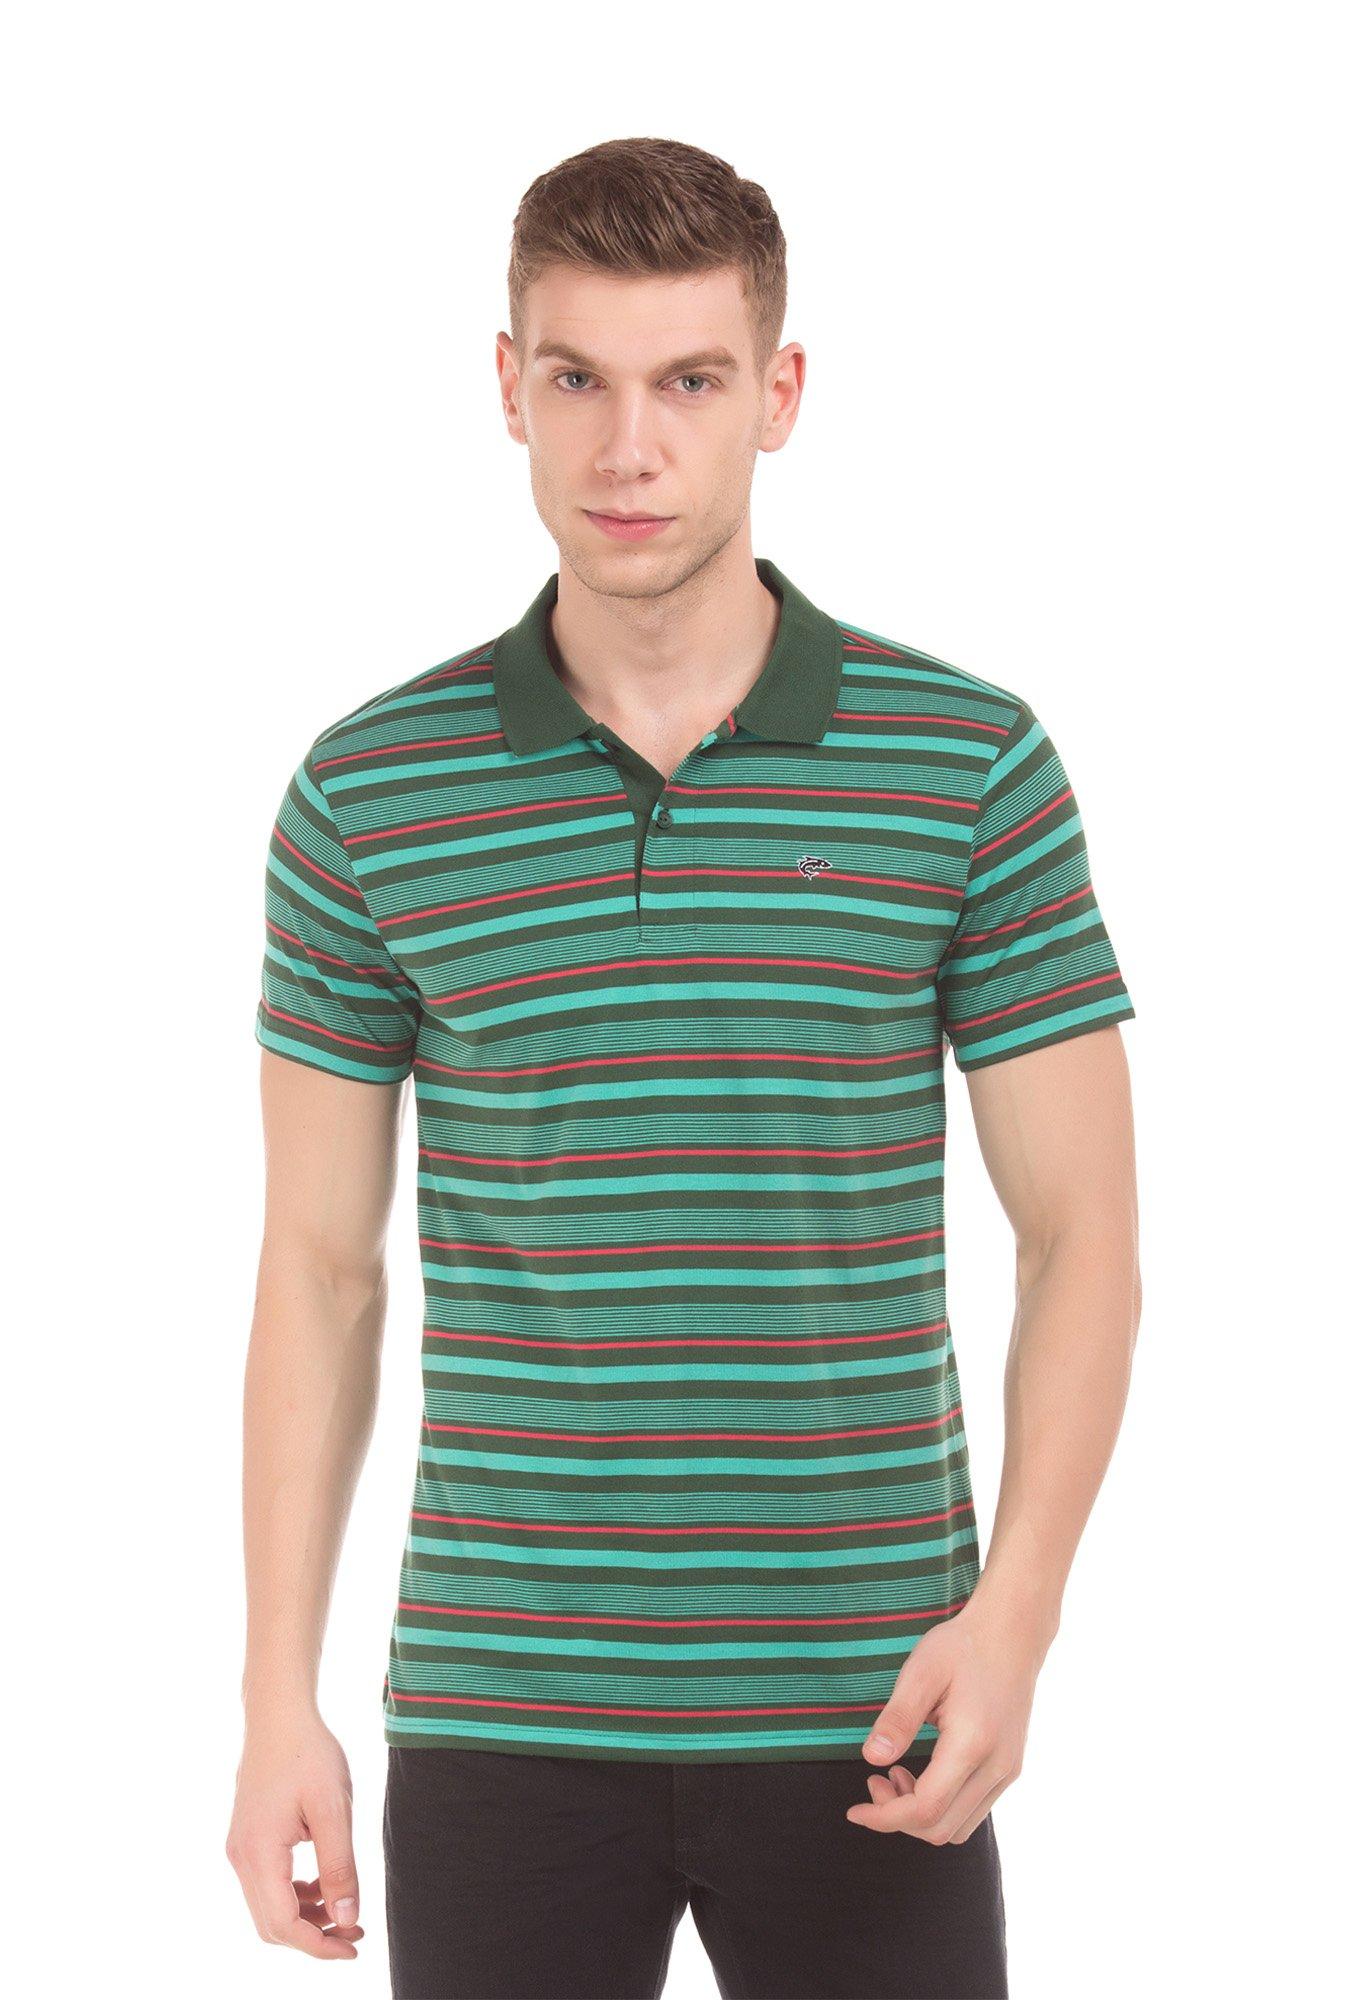 906b95b39f709f Buy Ruggers Green Cotton Polo T-Shirt for Men Online @ Tata CLiQ